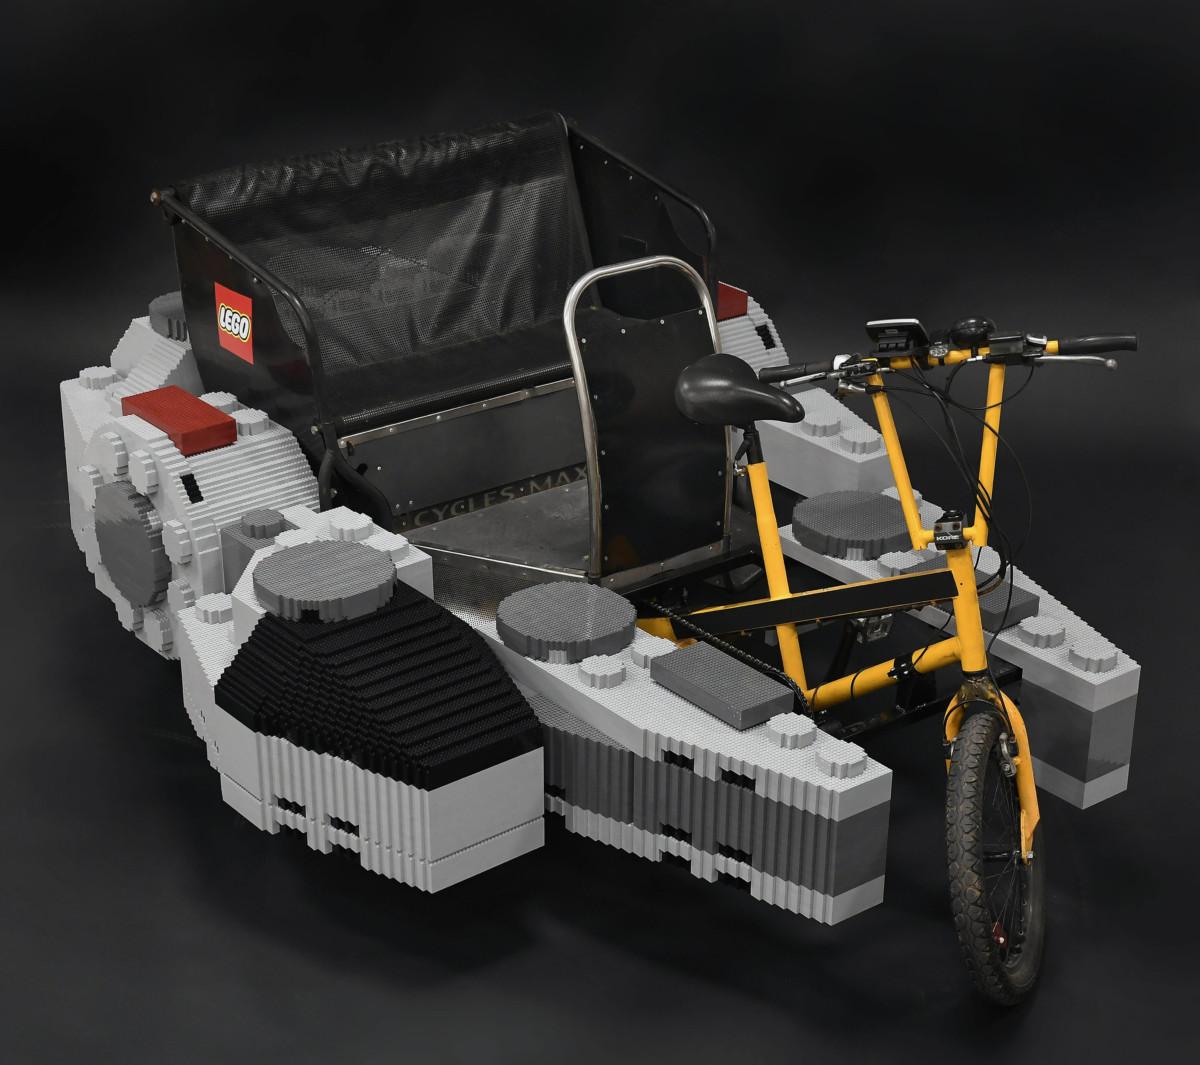 THE LEGO GROUP TAKES FLIGHT 8